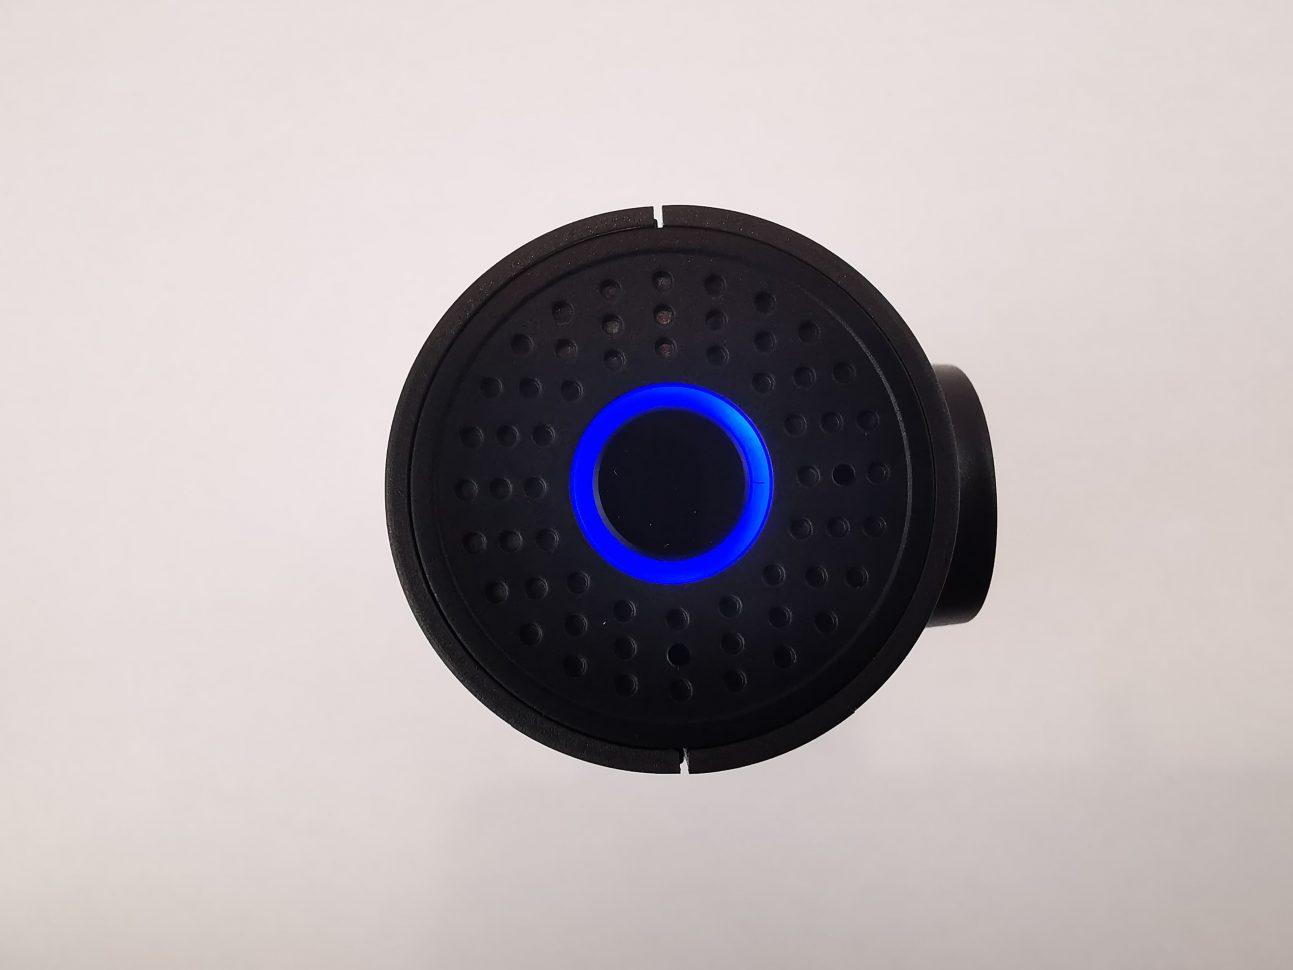 LED albastru Xiaomi 70 MAI